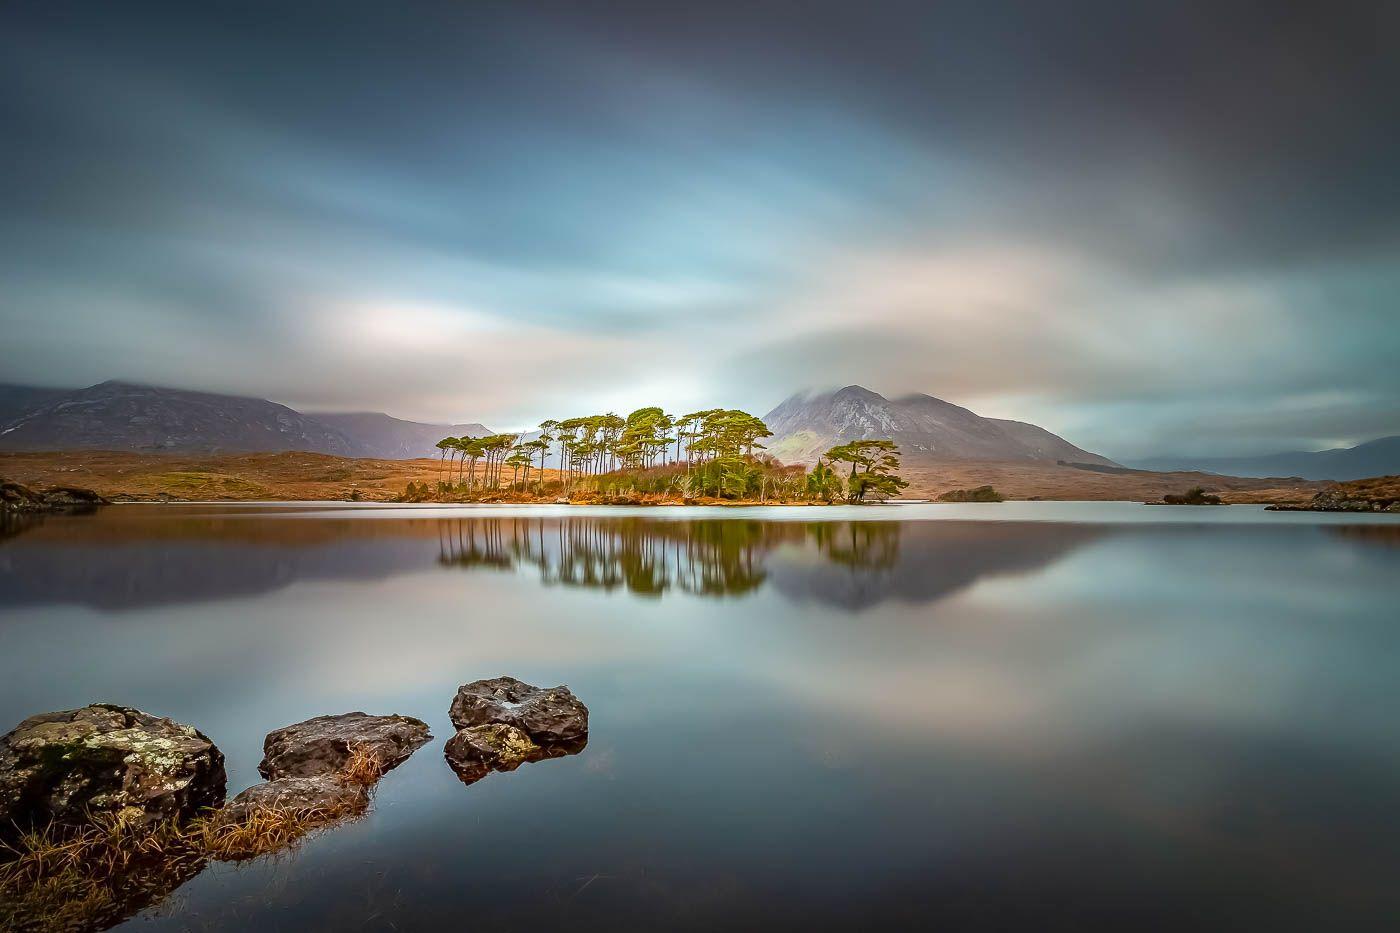 #landscape, #seascape, #waterscape, #lake, #mirror, #reflection, #dynamic, #calm, #sky, #clouds, #island, #trees, #stones, #ireland, #canon, #longexposure, #nature, #beautiful, #colorful, #mountains, Karolina Konsur